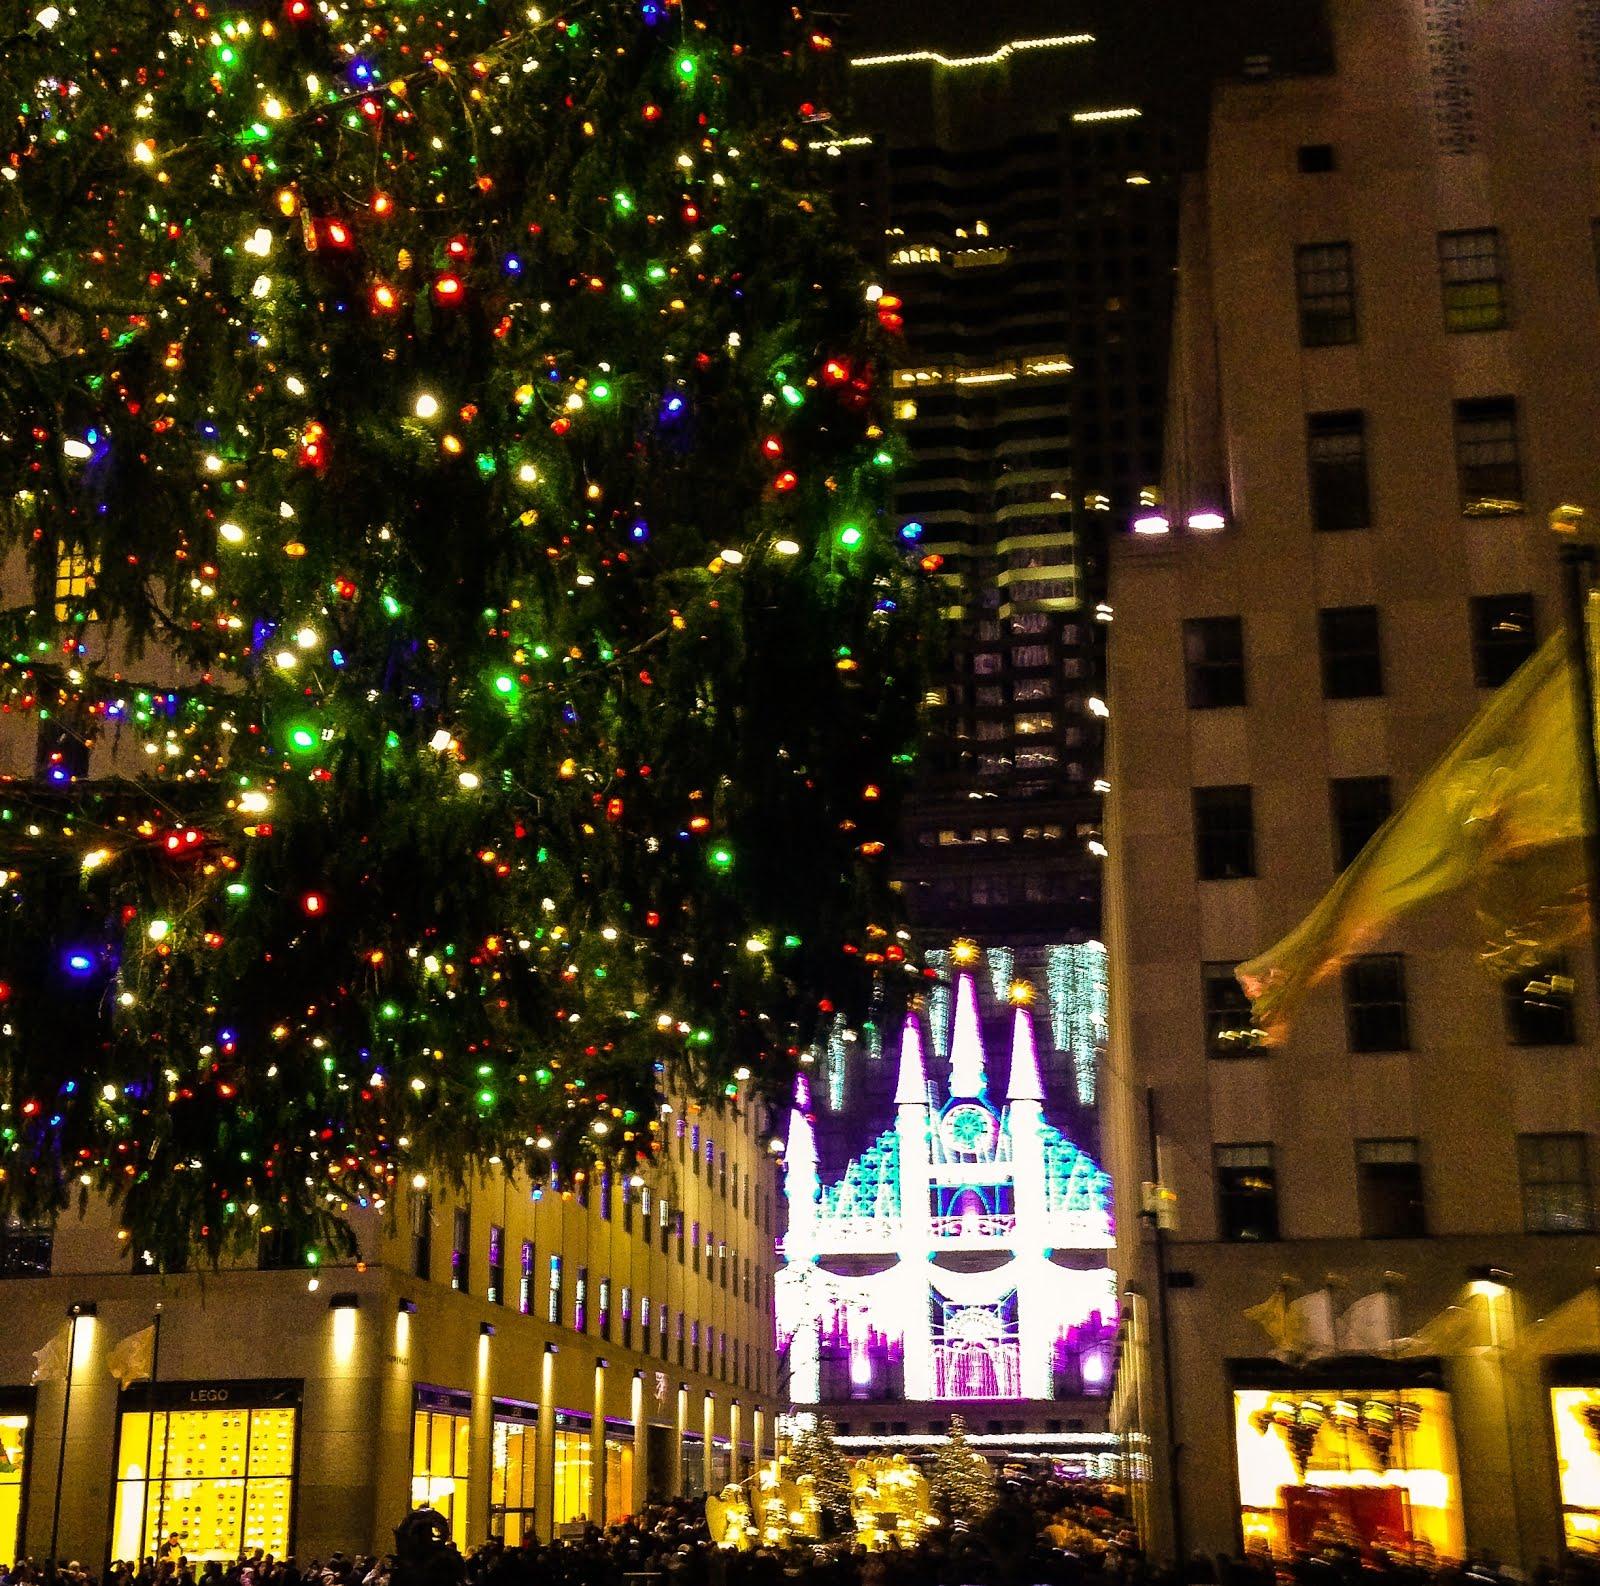 Saks Fifth Avenue Lights Show In Rockefeller Center, New York City